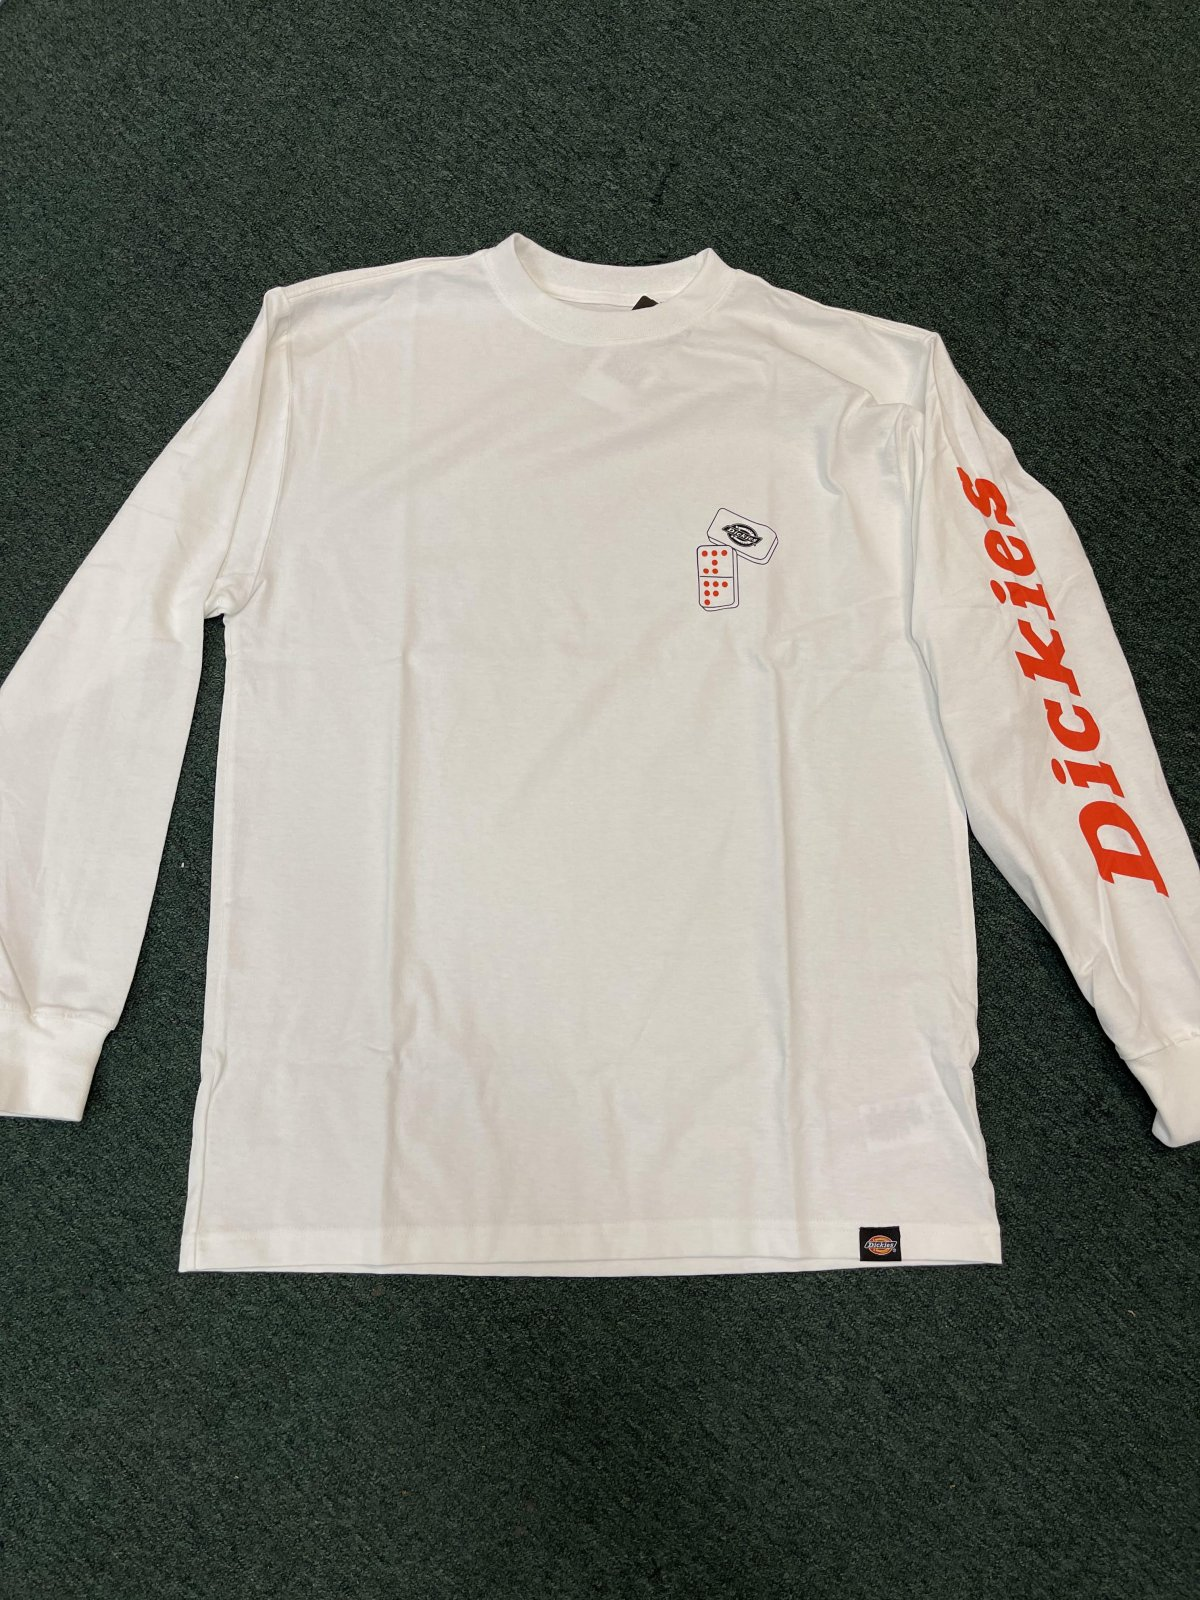 Dickies Jamie Foy Long Sleeve Graphic T-Shirt